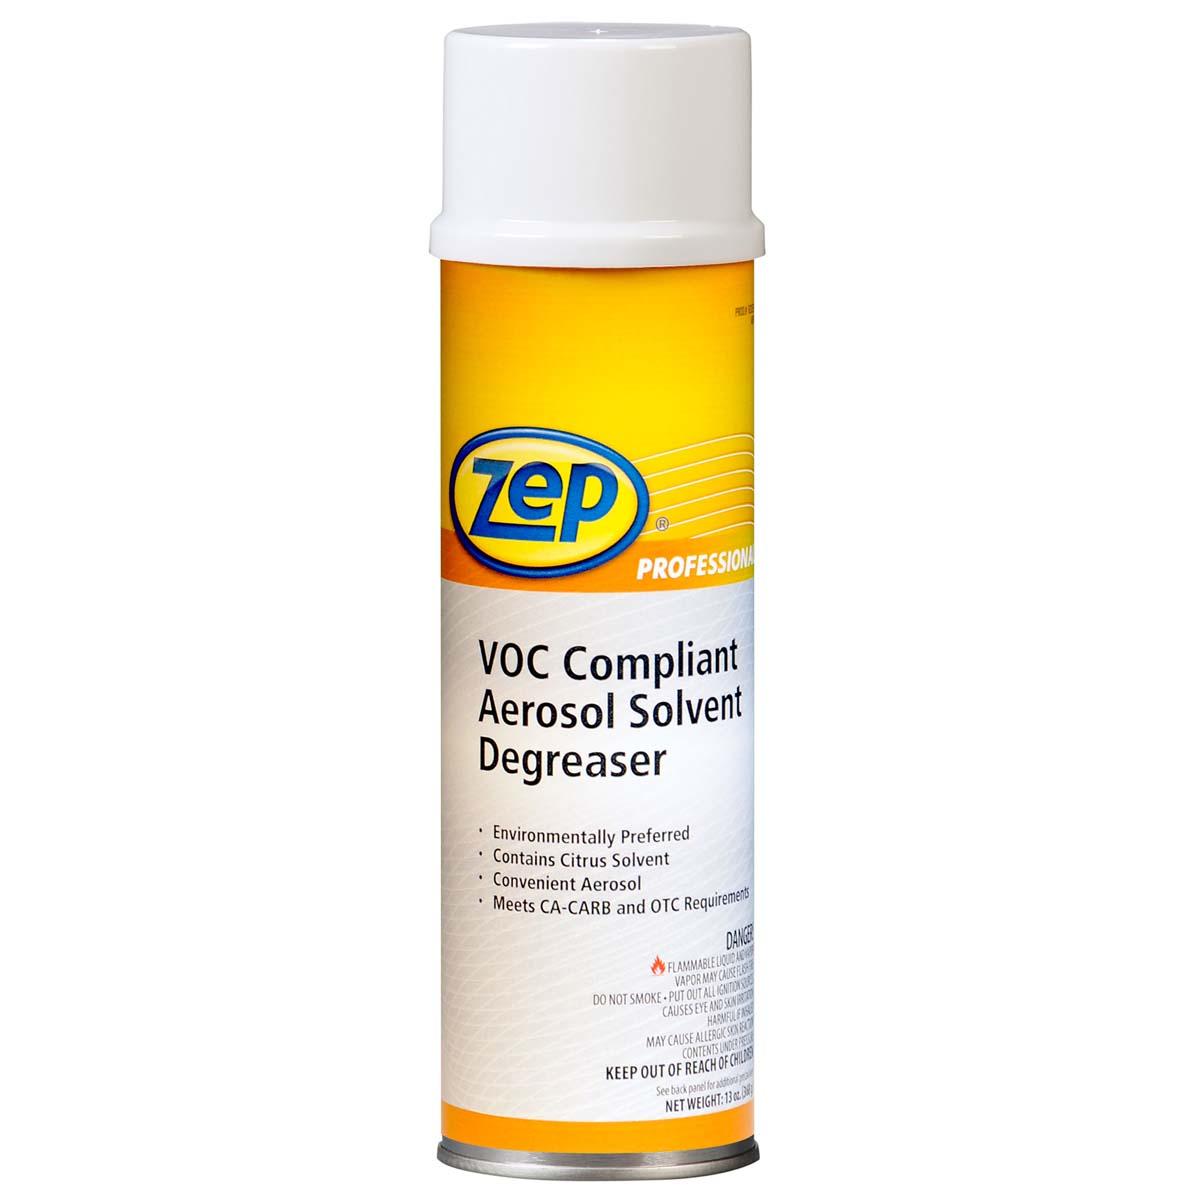 ZEP VOC Compliant Aerosol Solvent Degreaser